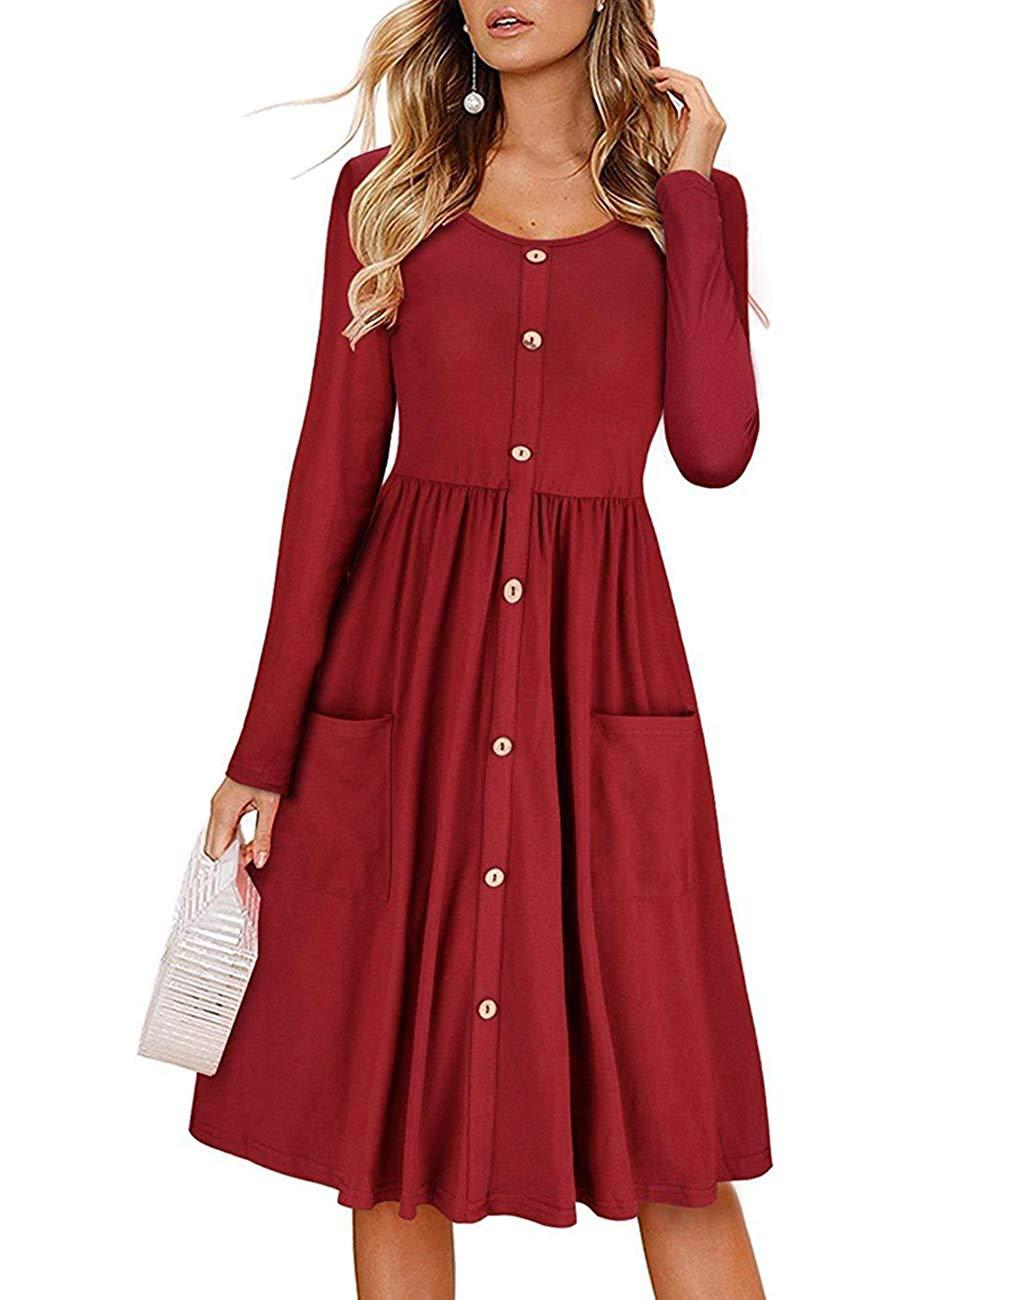 358d6689ccb Get Quotations · Womens Casual Long Sleeve Crewneck Dress Button Down Swing Midi  Pockets Dress